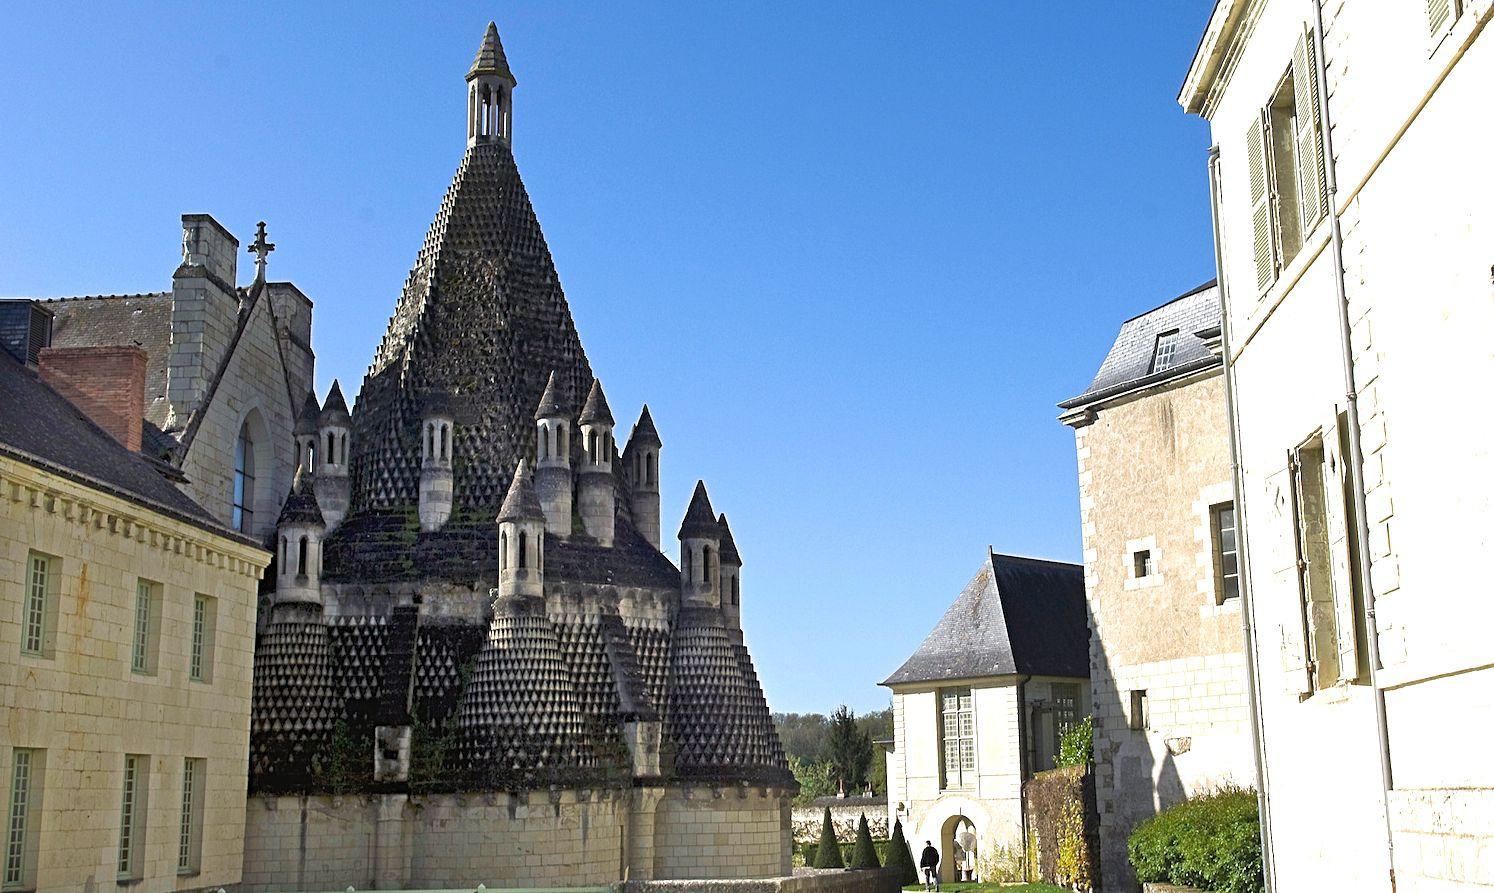 Les étonnantes cuisines de l'abbaye de Fontevrault